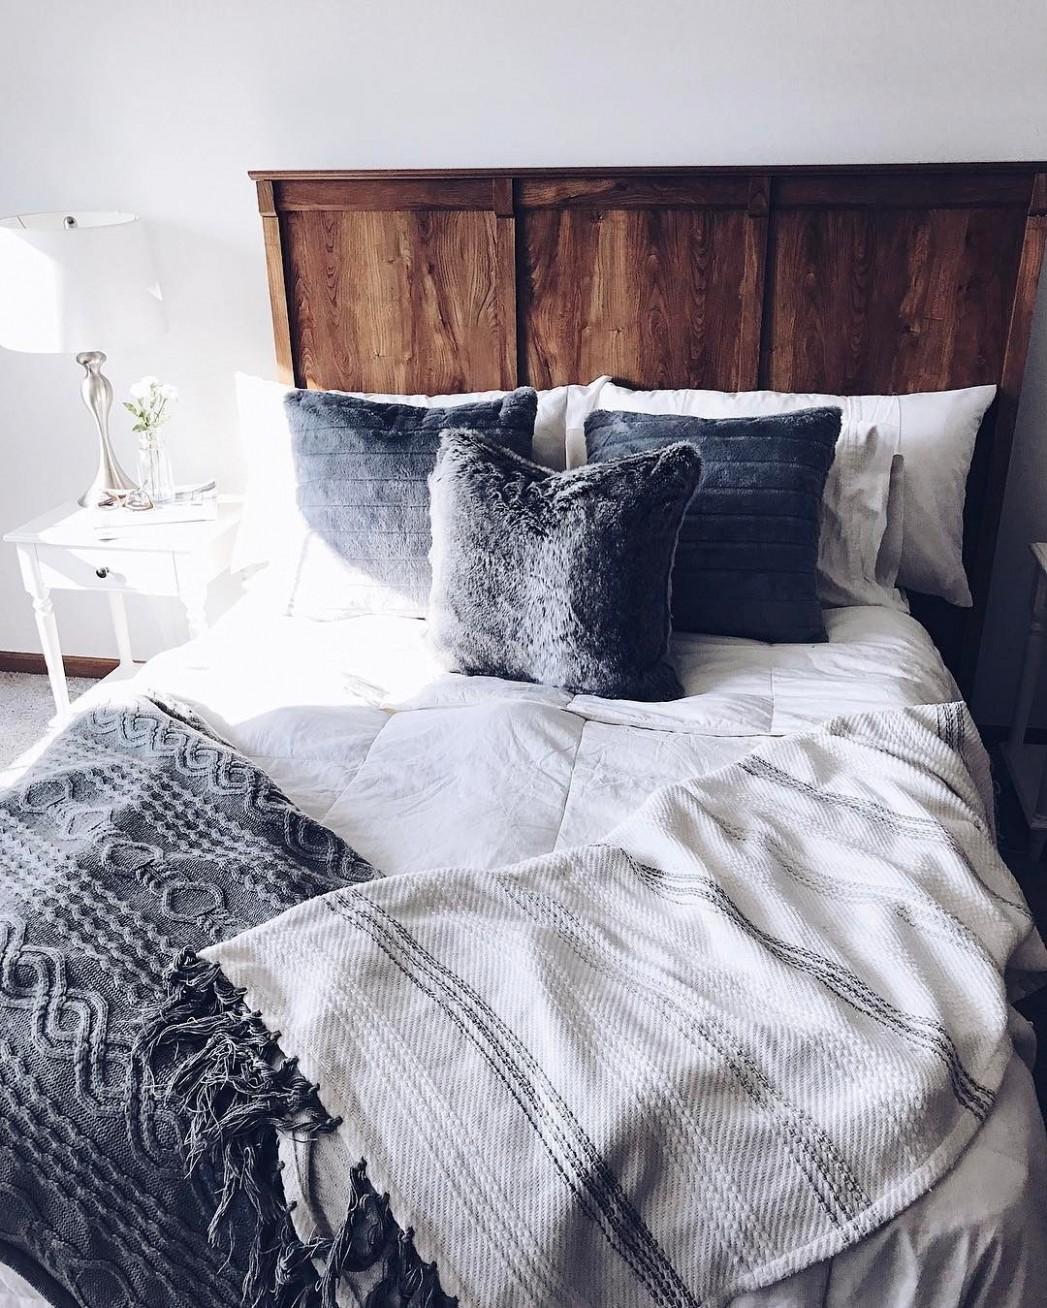 Rustic & grey bedroom  Rustic grey bedroom, Rustic bedroom  - Bedroom Ideas Rustic